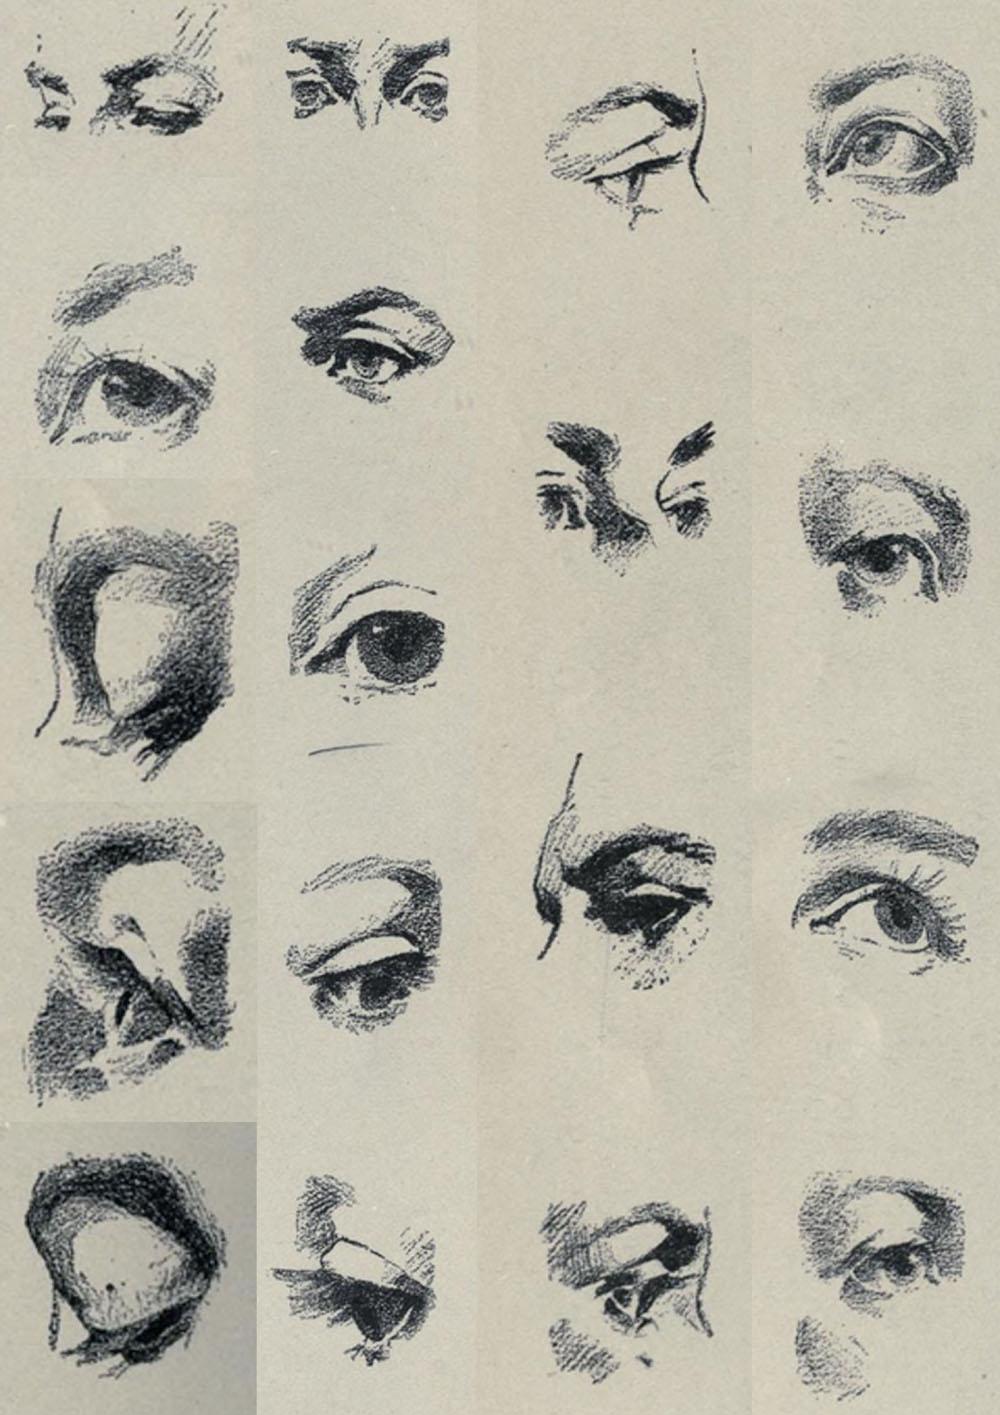 carlo-ruini-anatomia-ojos